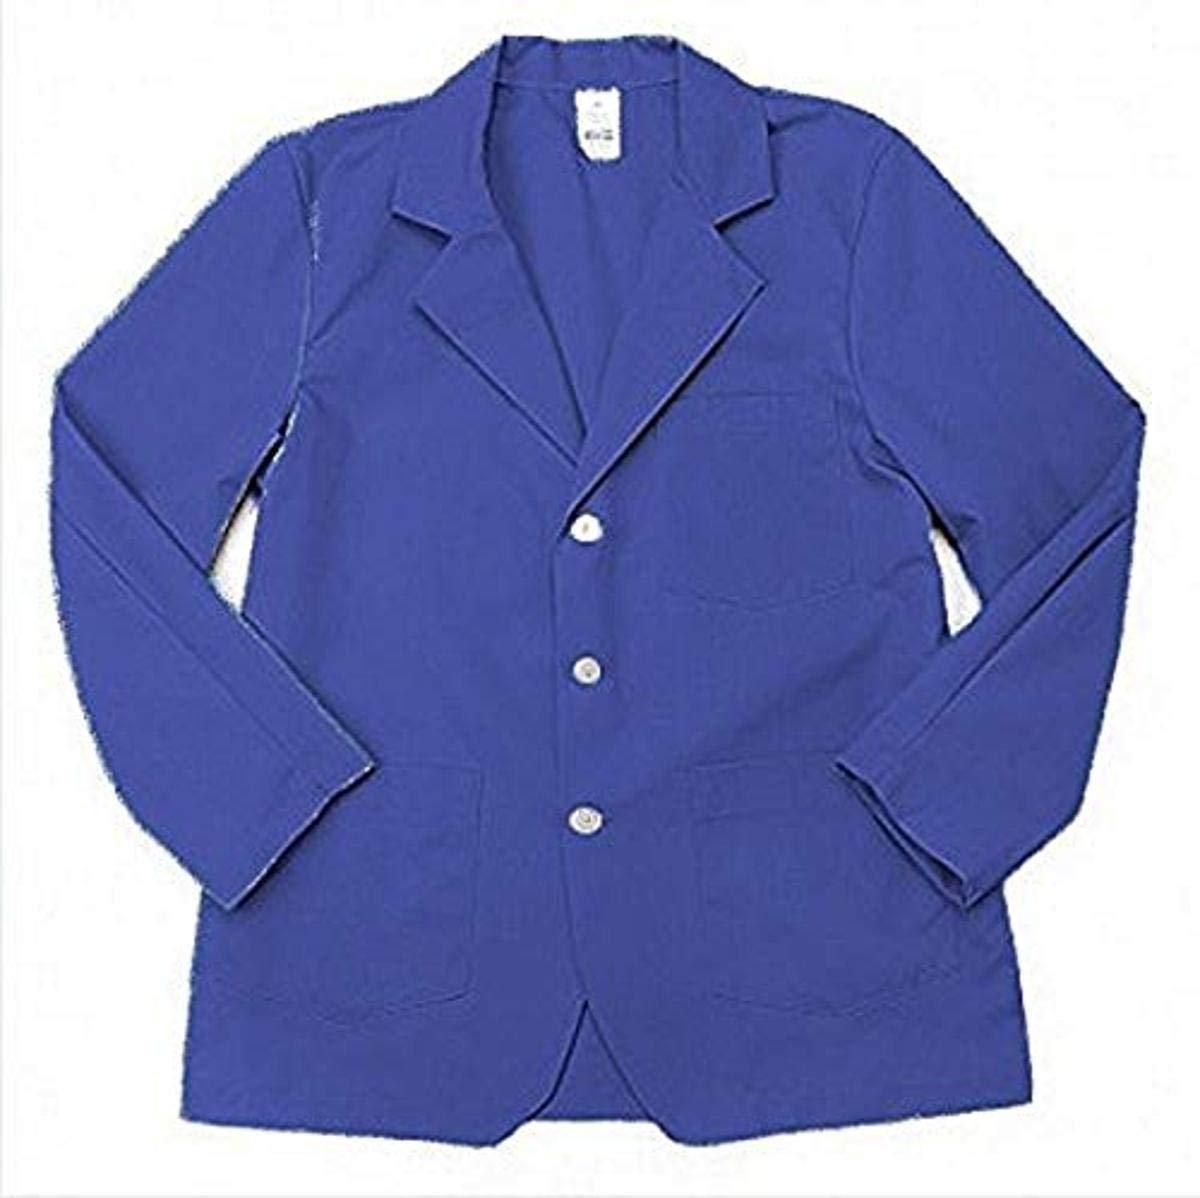 Pinnacle Textile LC18 5.25 OZ POPLIN 65/35 Polyester/Cotton, Lapel/Counter Coat-Large-Royal